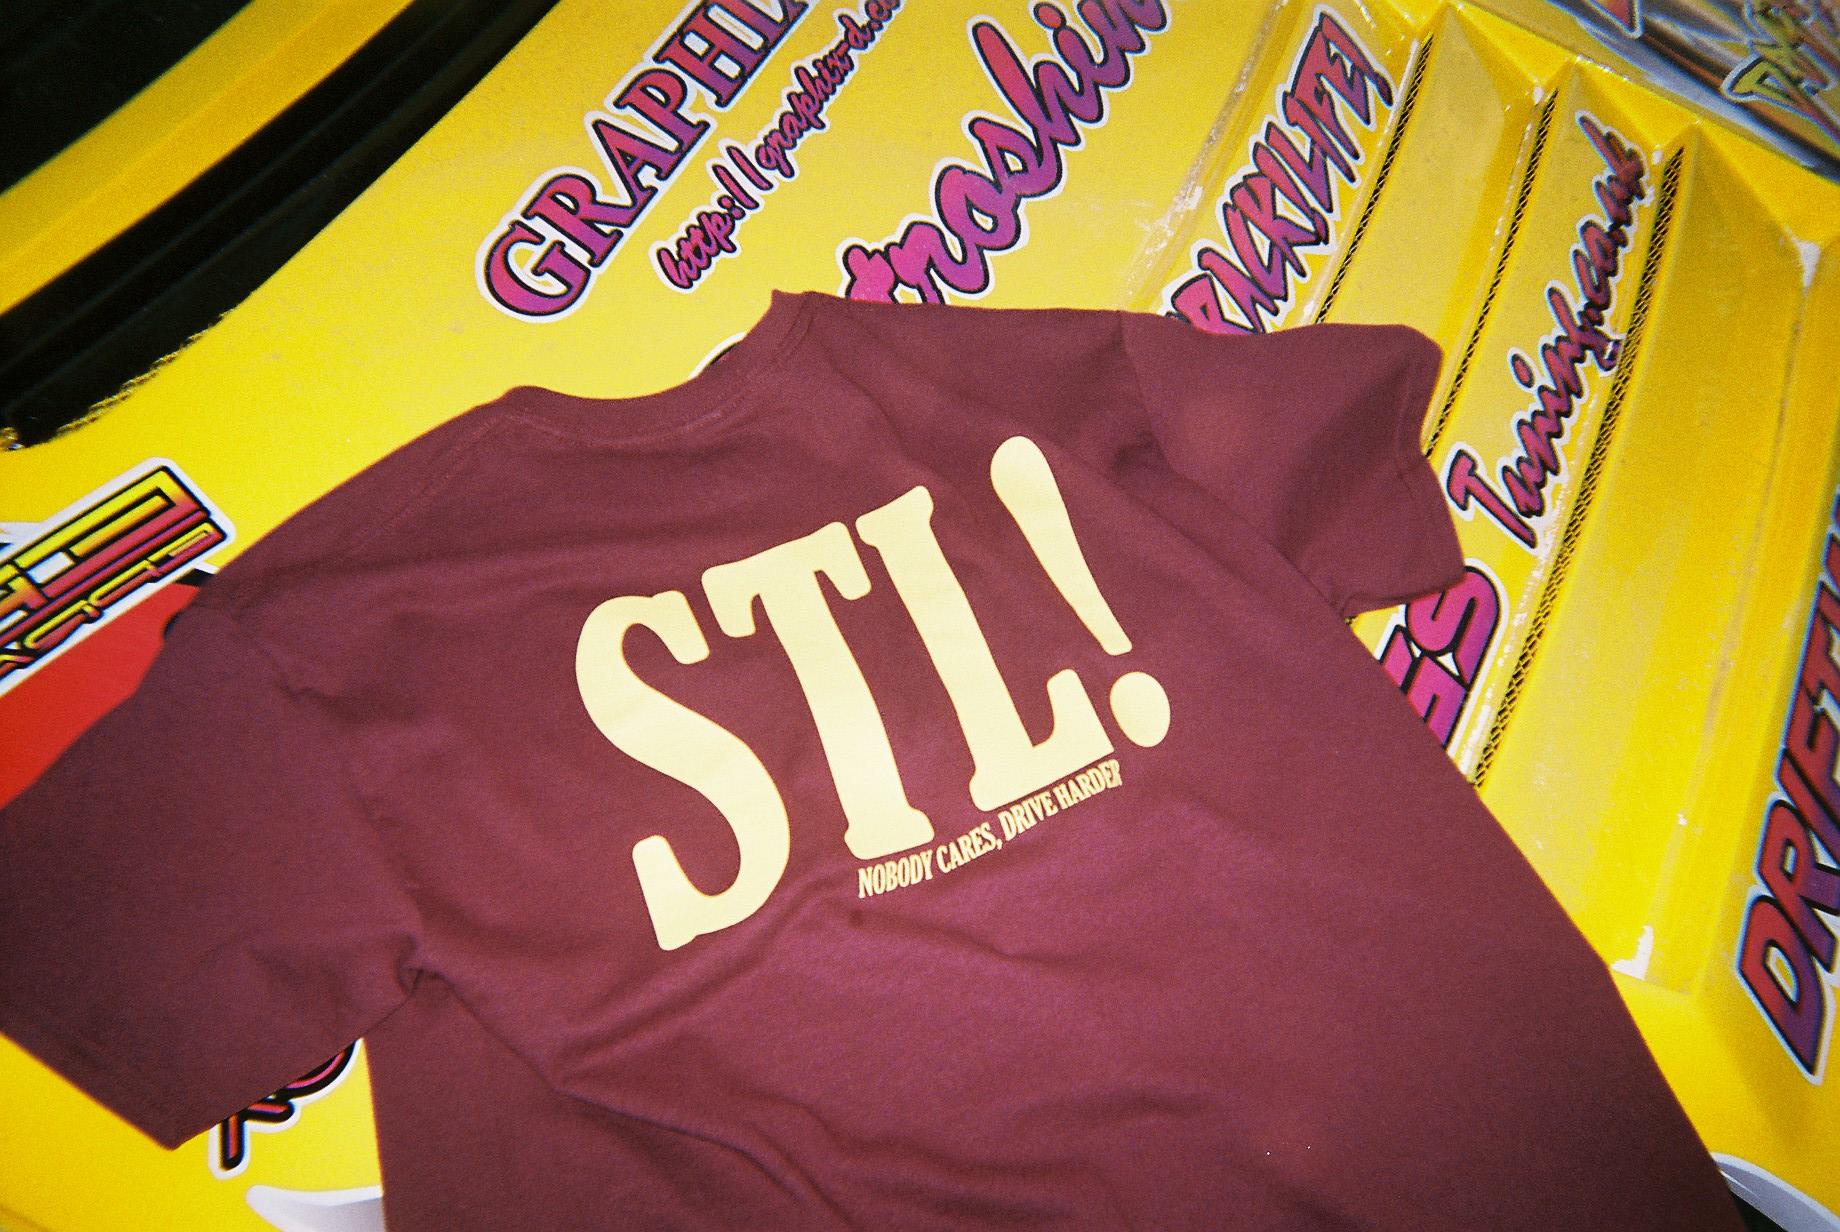 STL! 2018 T-SHIRT